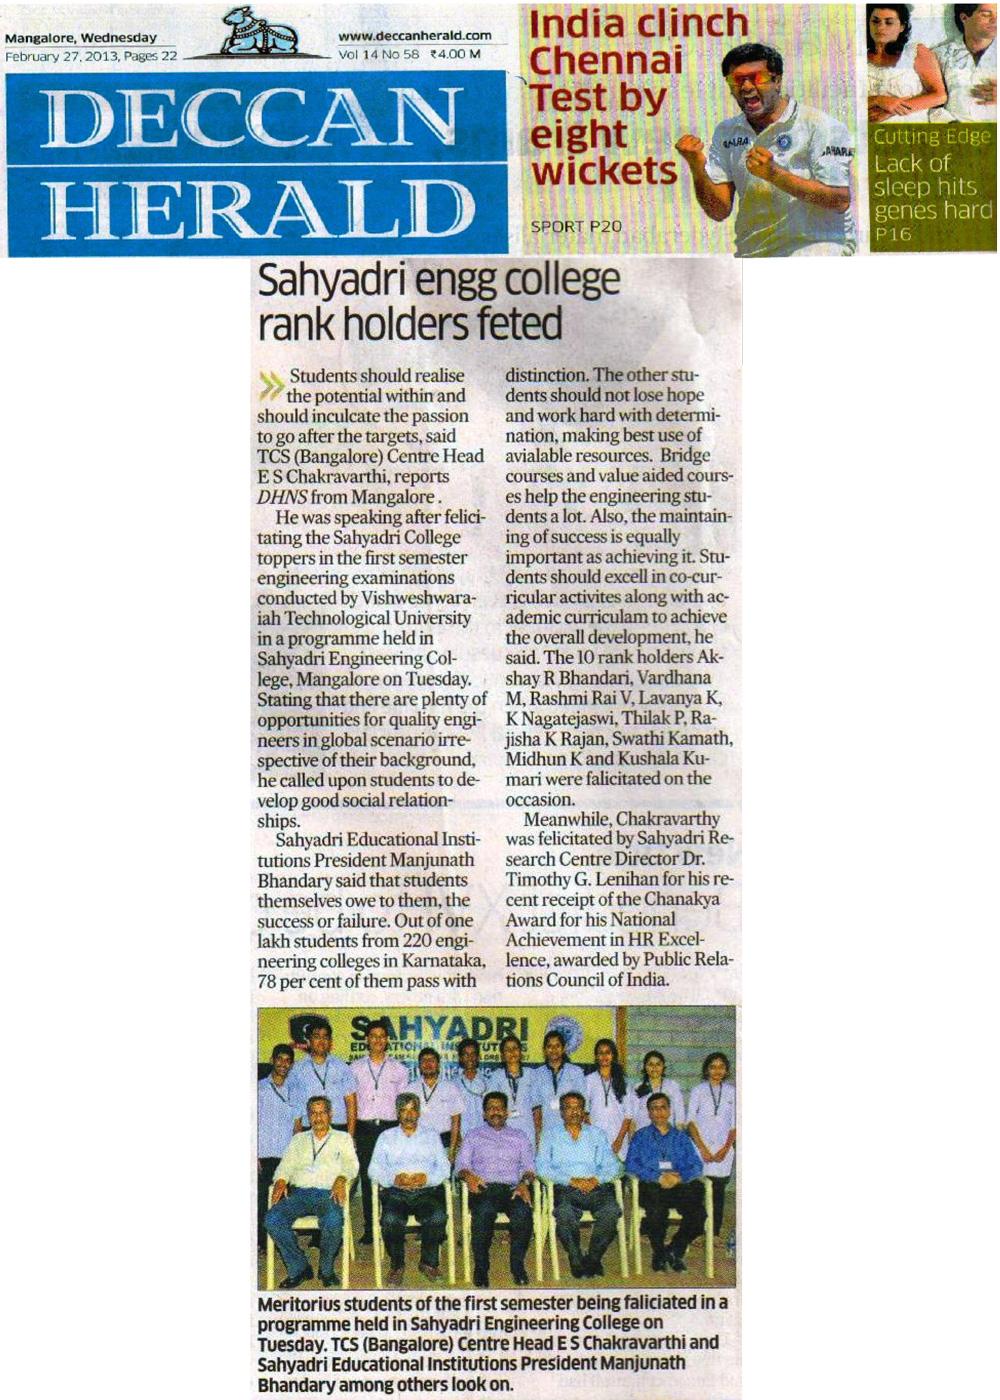 Deccan-Herald-27-02-2013